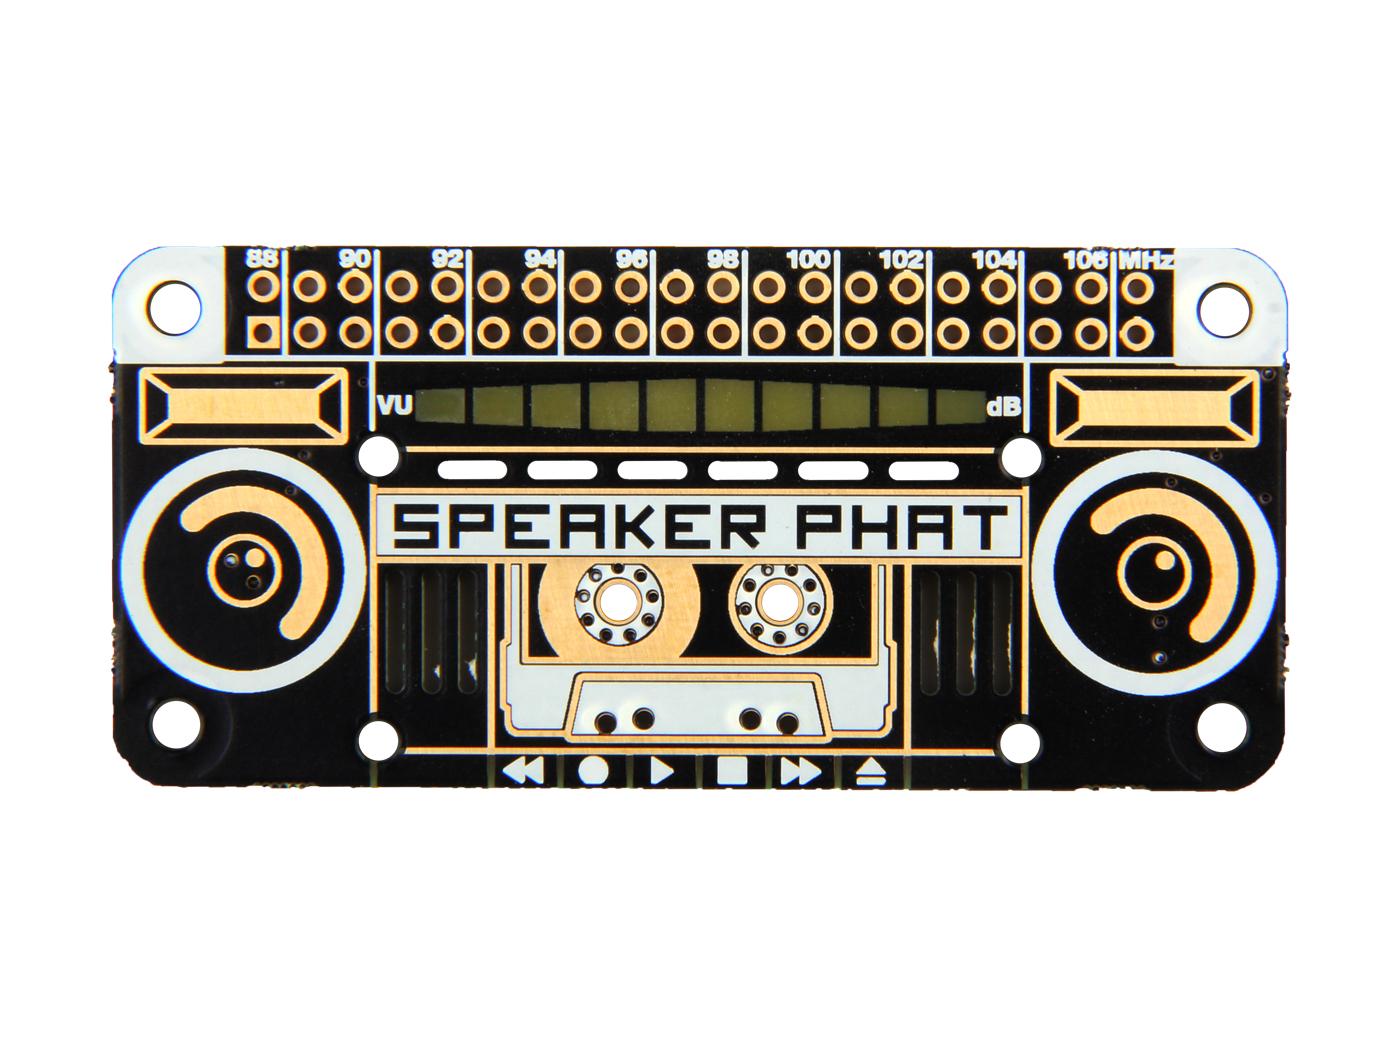 Grove Speaker Actuator Seeed Studio Plastic Smart Bracelet Bluetooth Circuit Board With High Pimoroni Phat